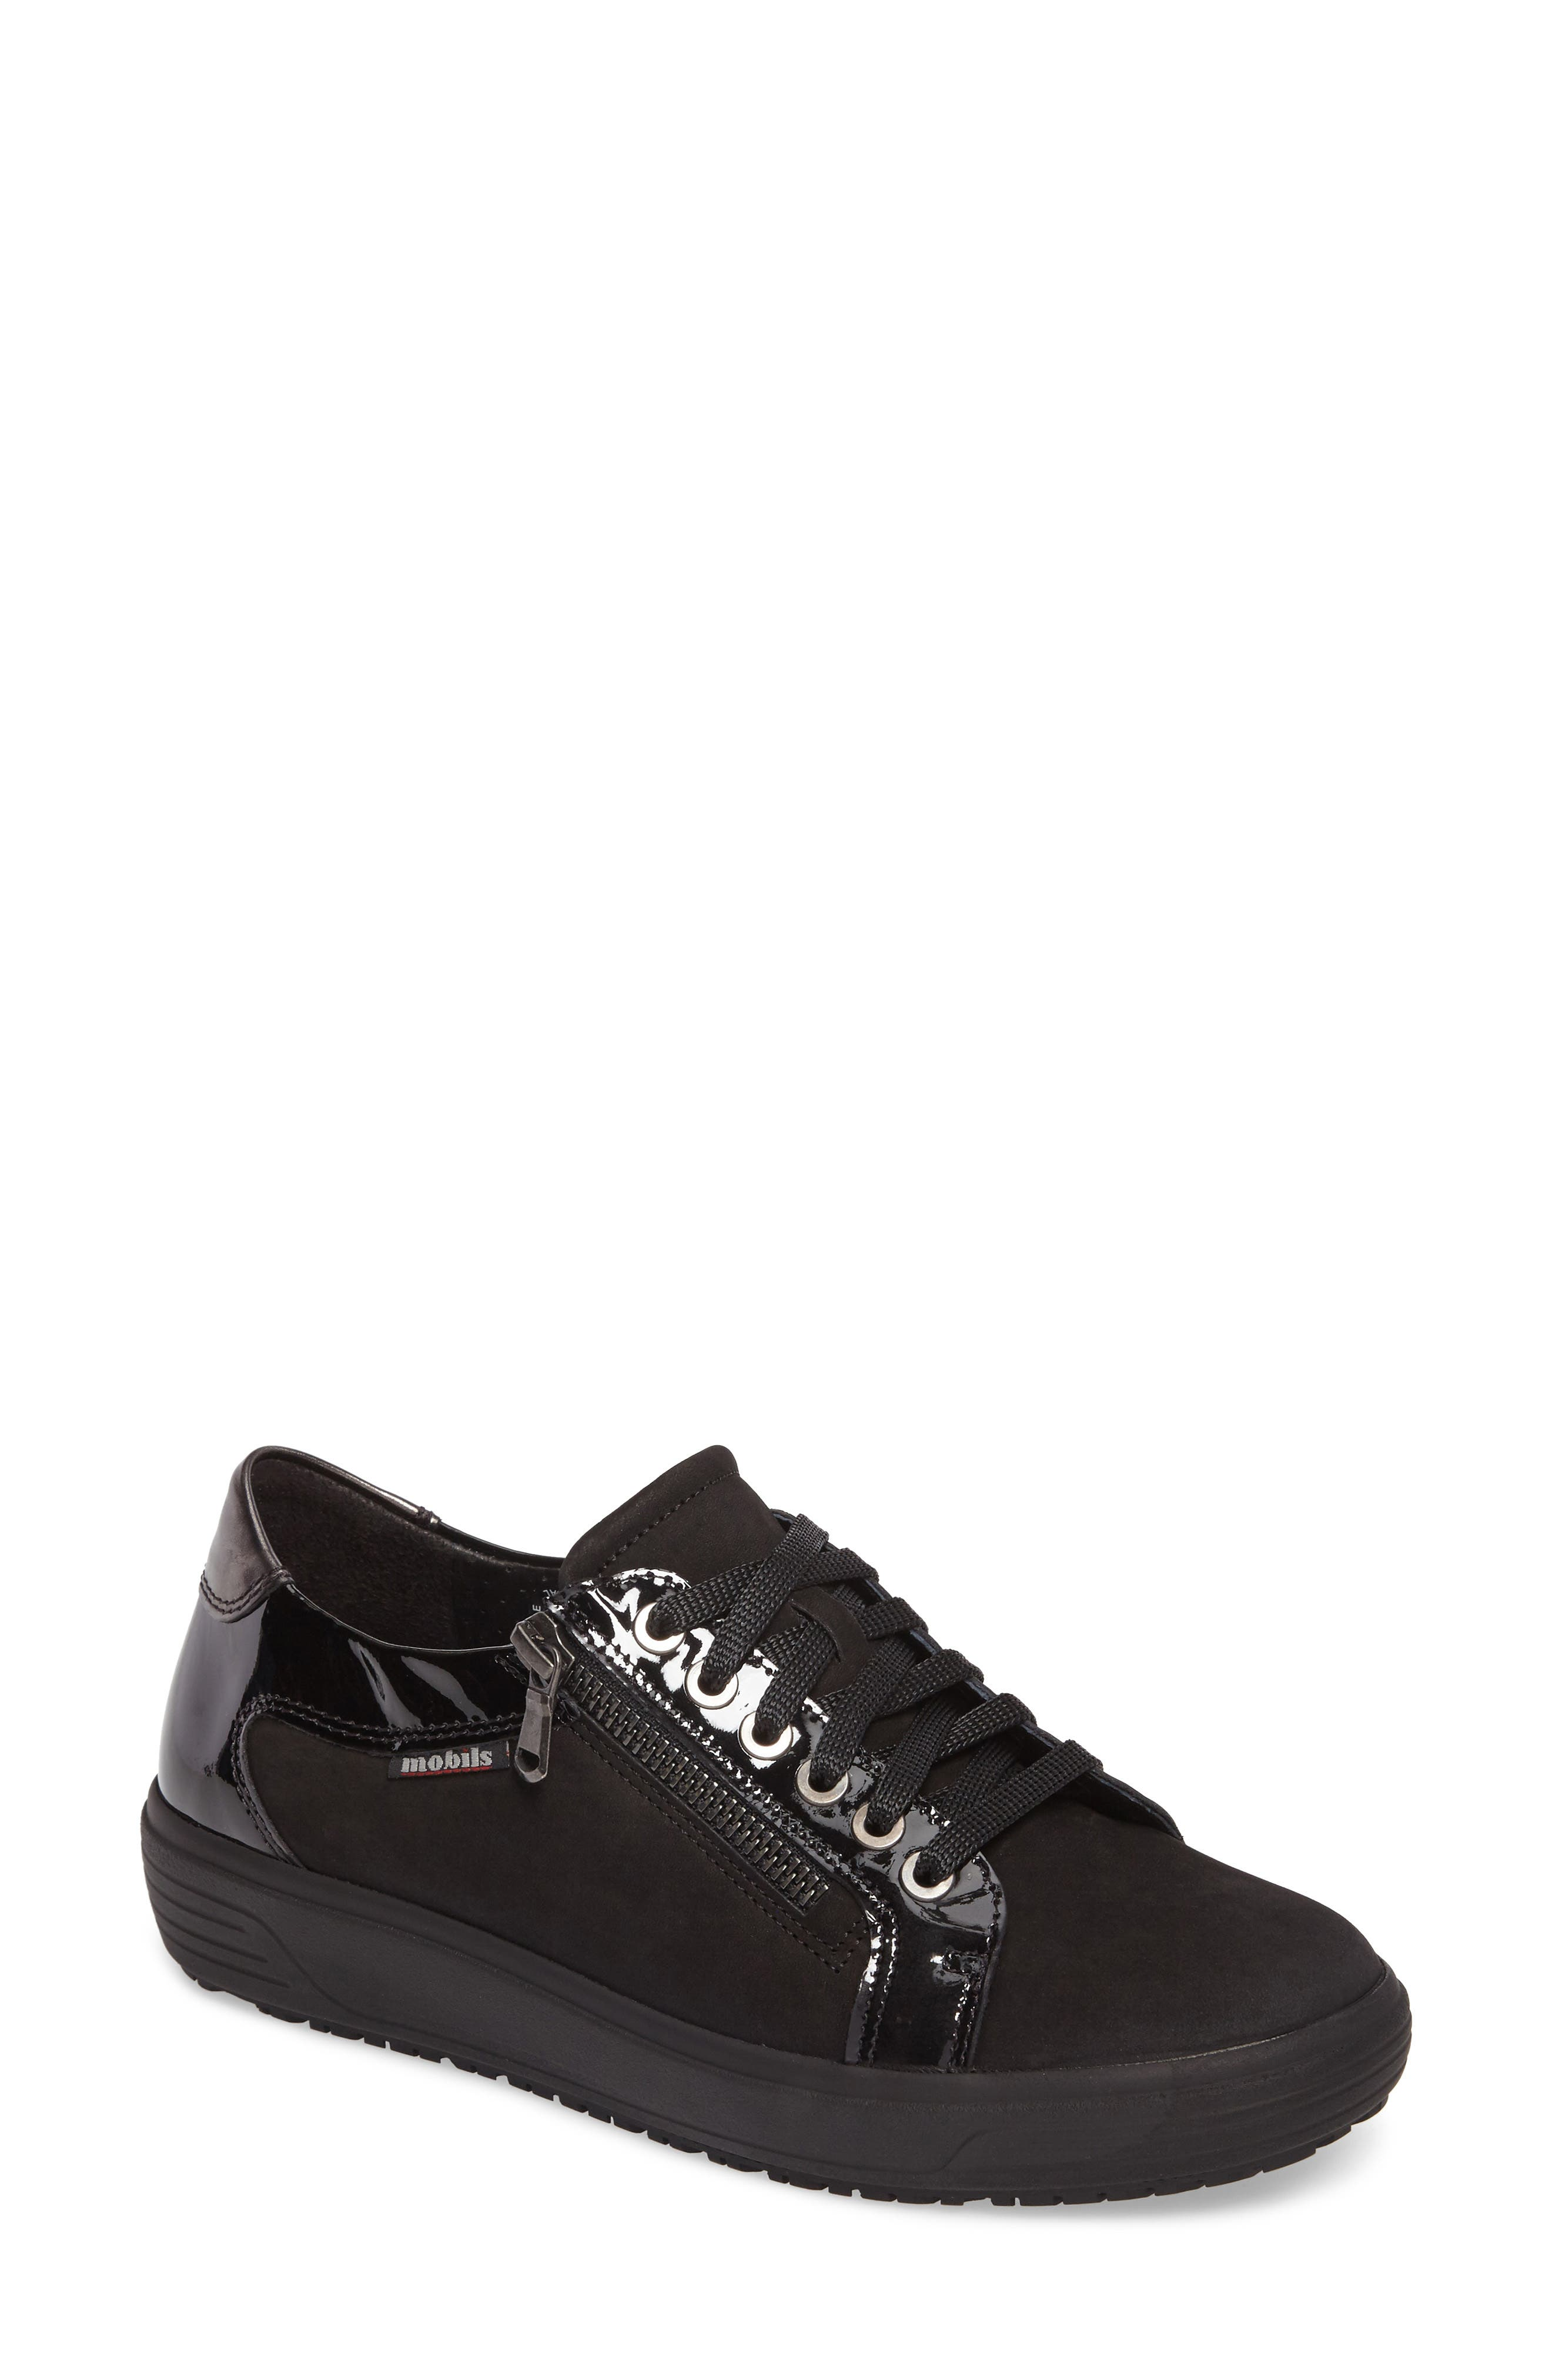 Mephisto Lenza Sneaker (Women)